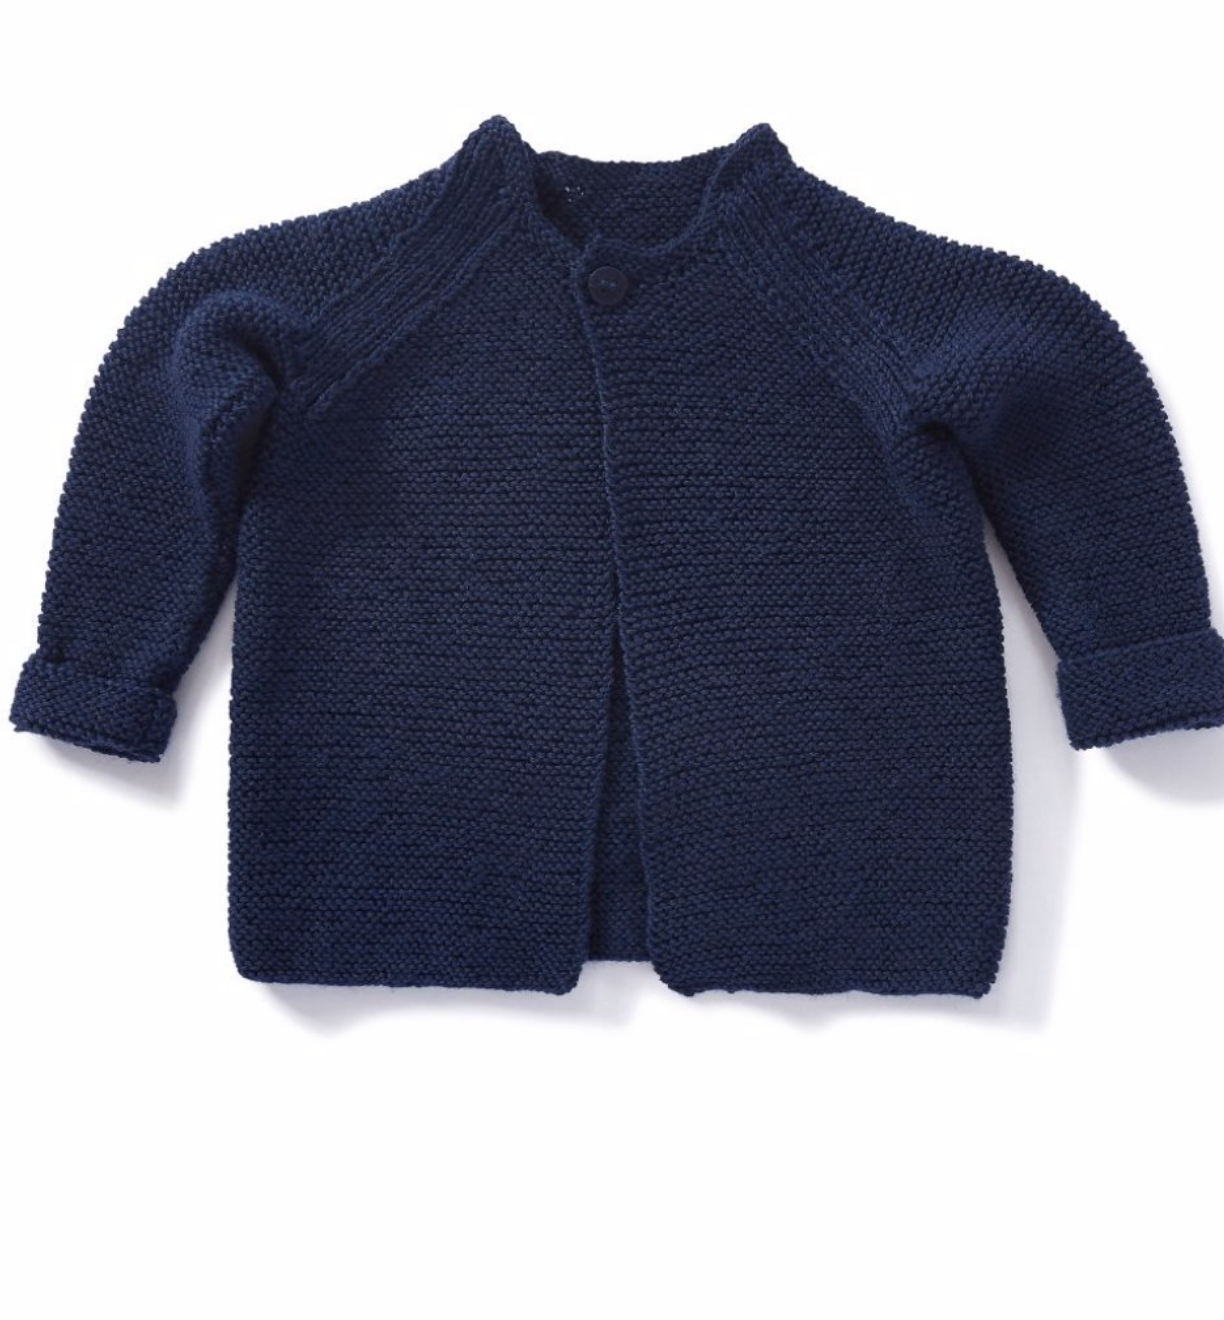 Bellissimo - ADA 641 - Sweater Pattern